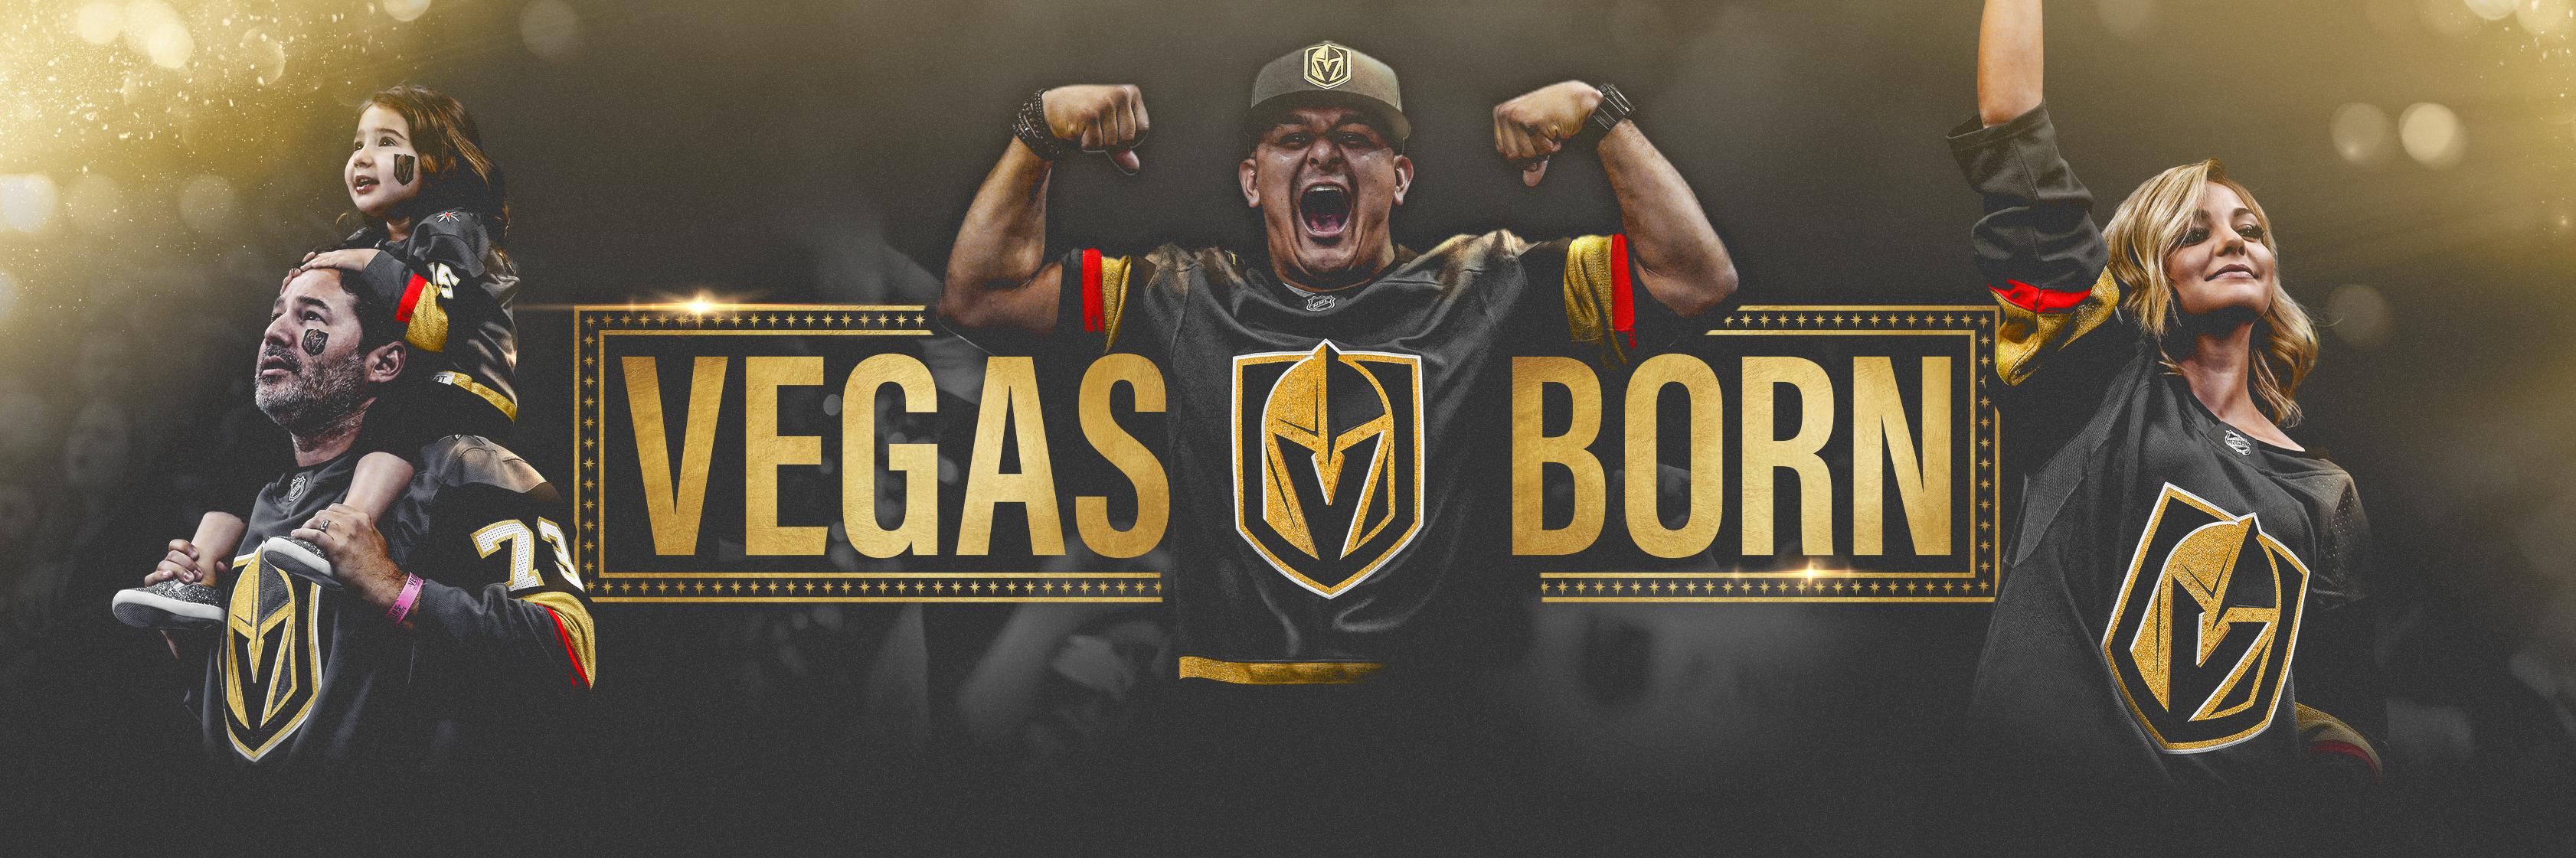 Exclusive: Golden Knights Unveil Updated 'Vegas Born' Marketing